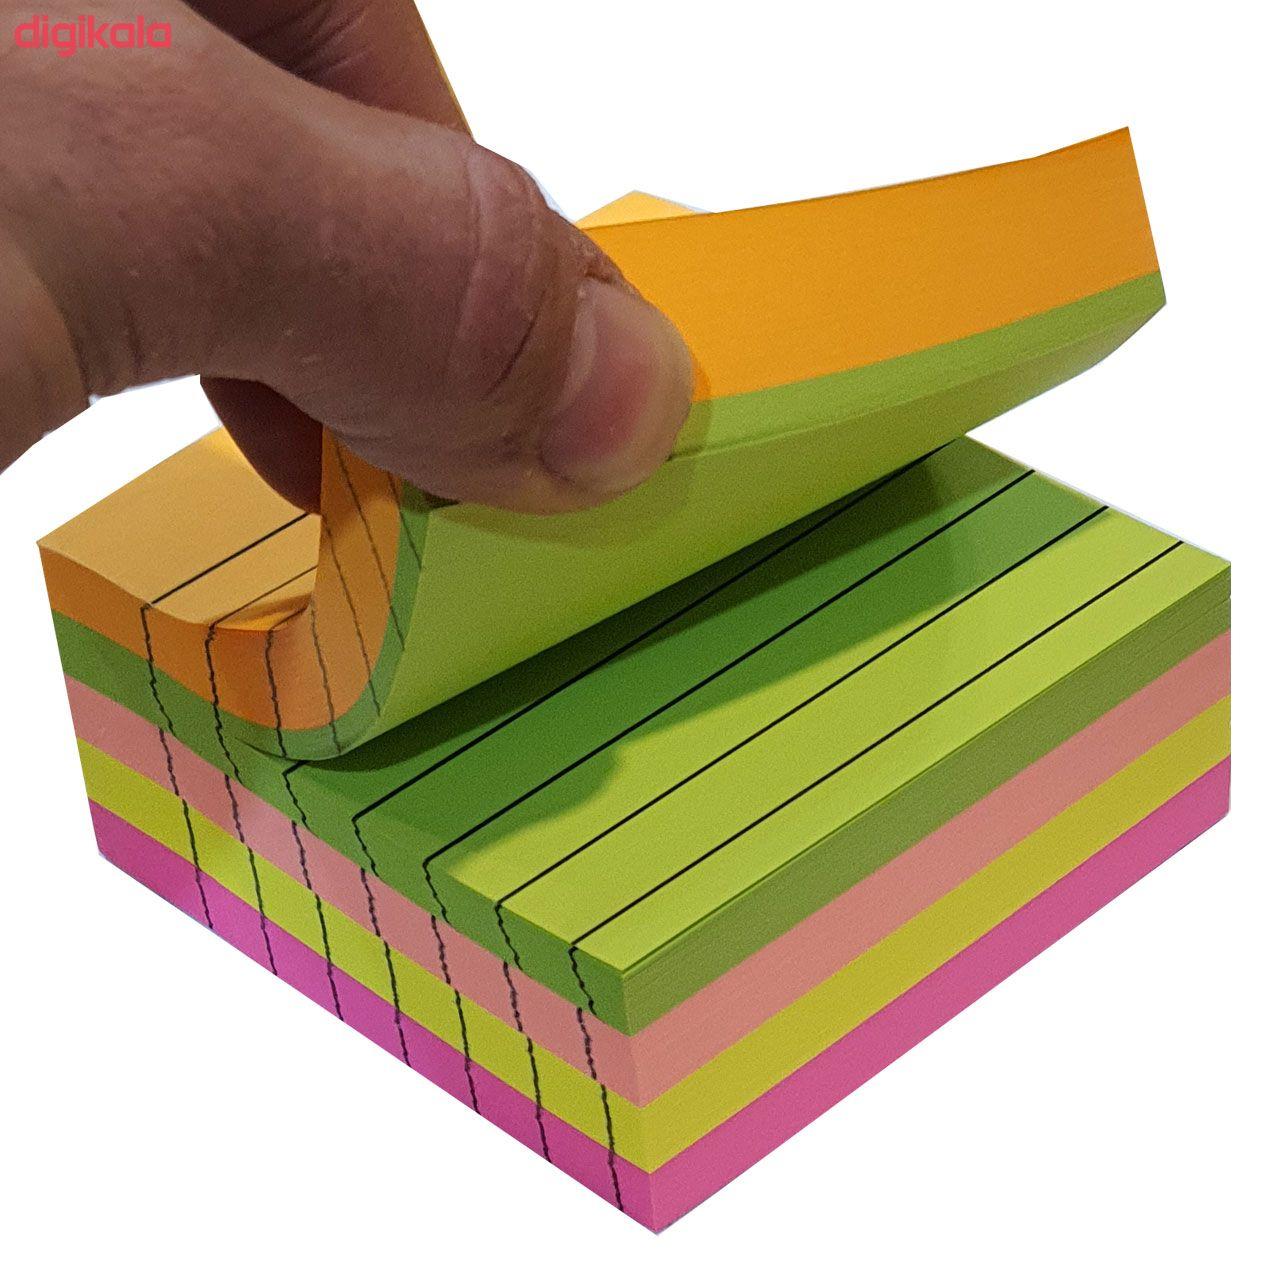 کاغذ یادداشت چسب دار  سان اسکای کد C400 main 1 3